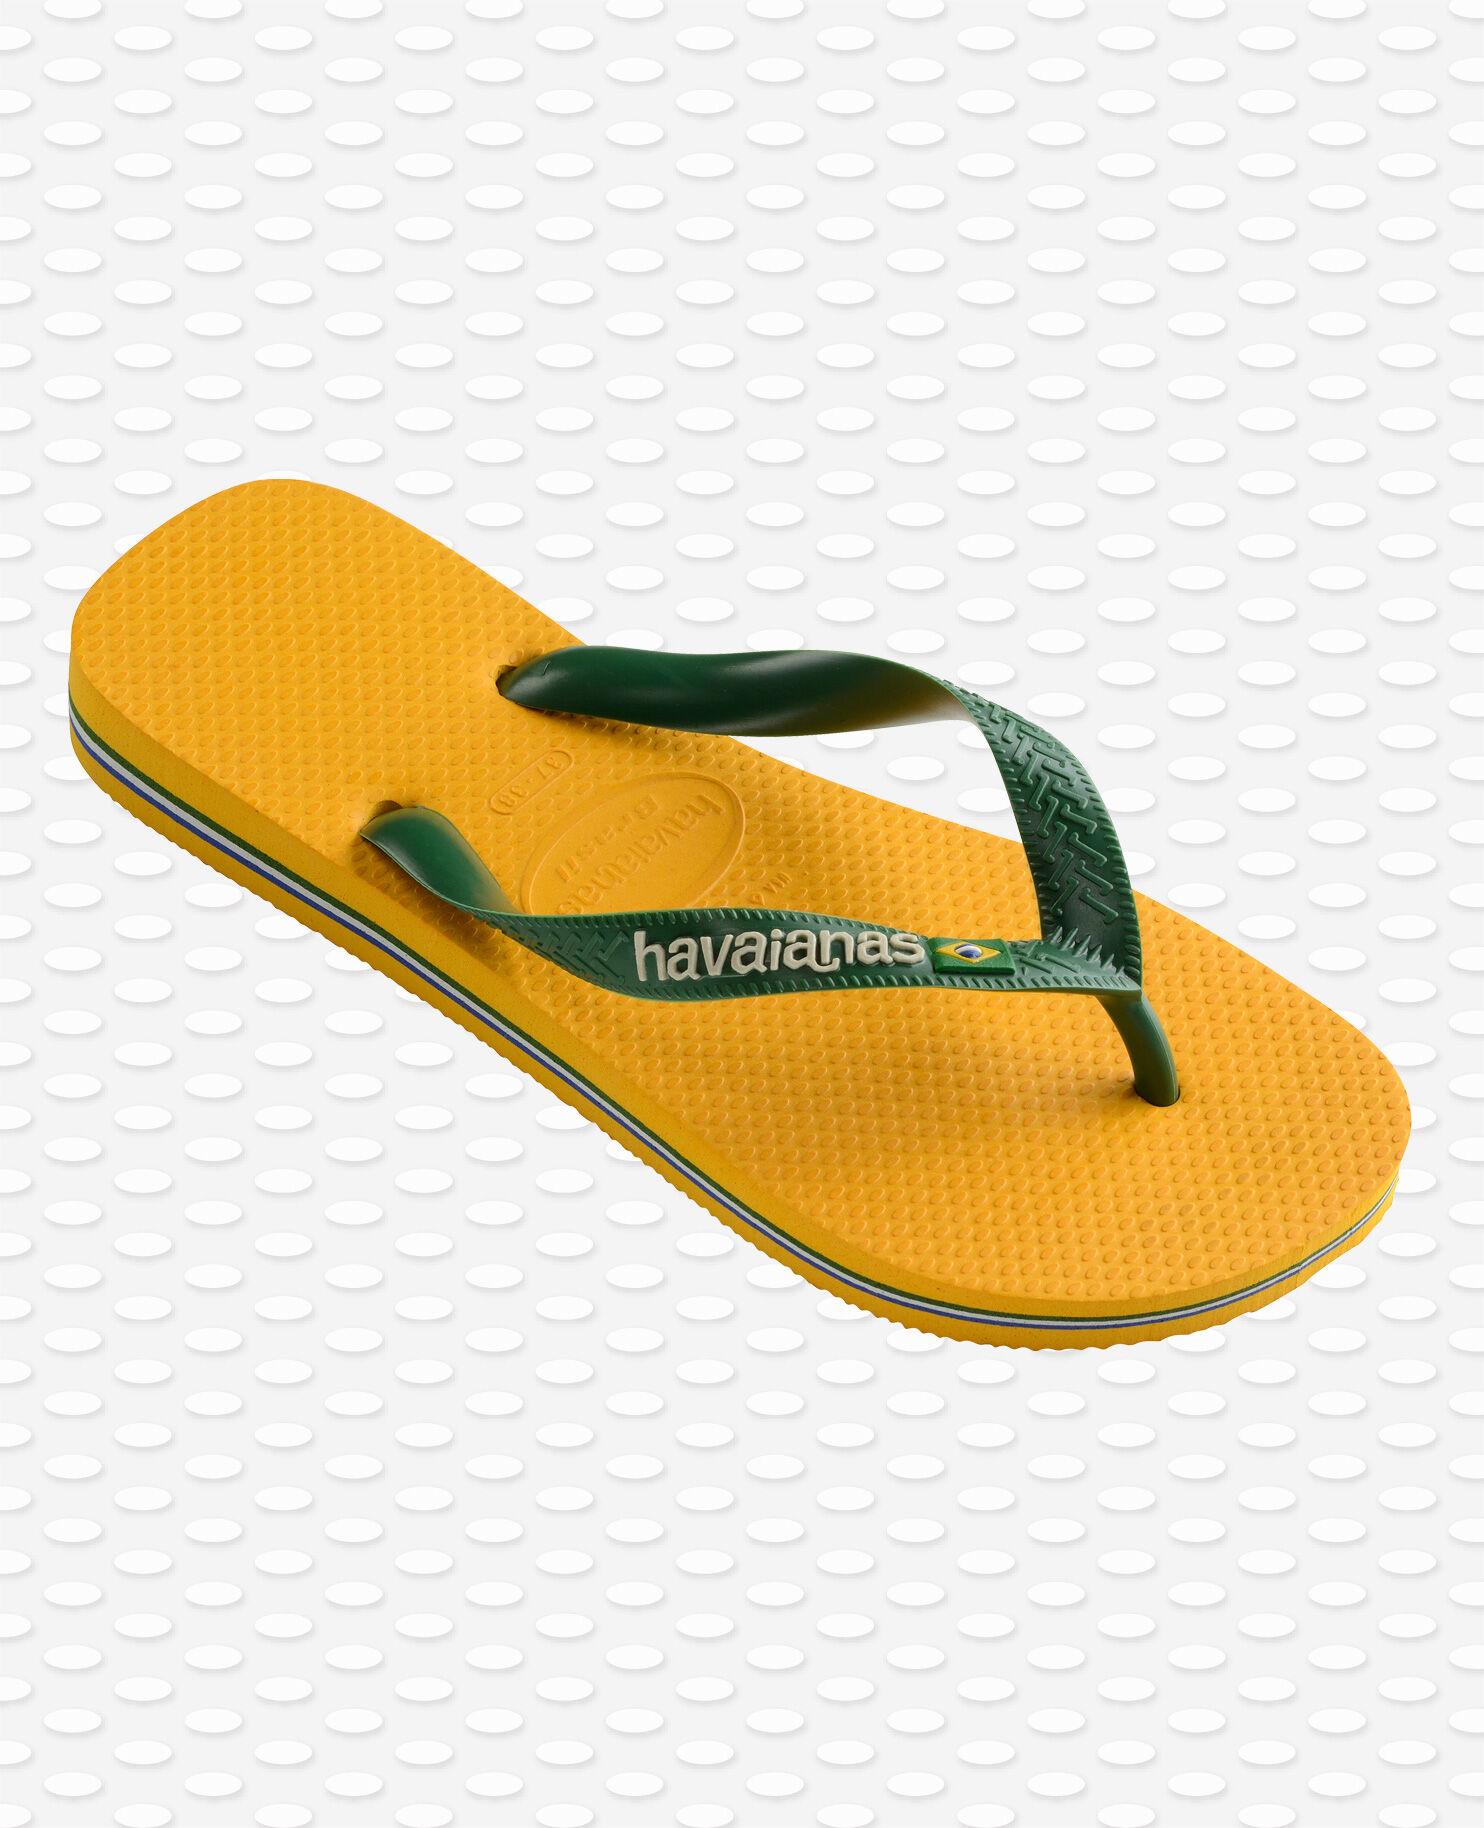 havaianas green yellow